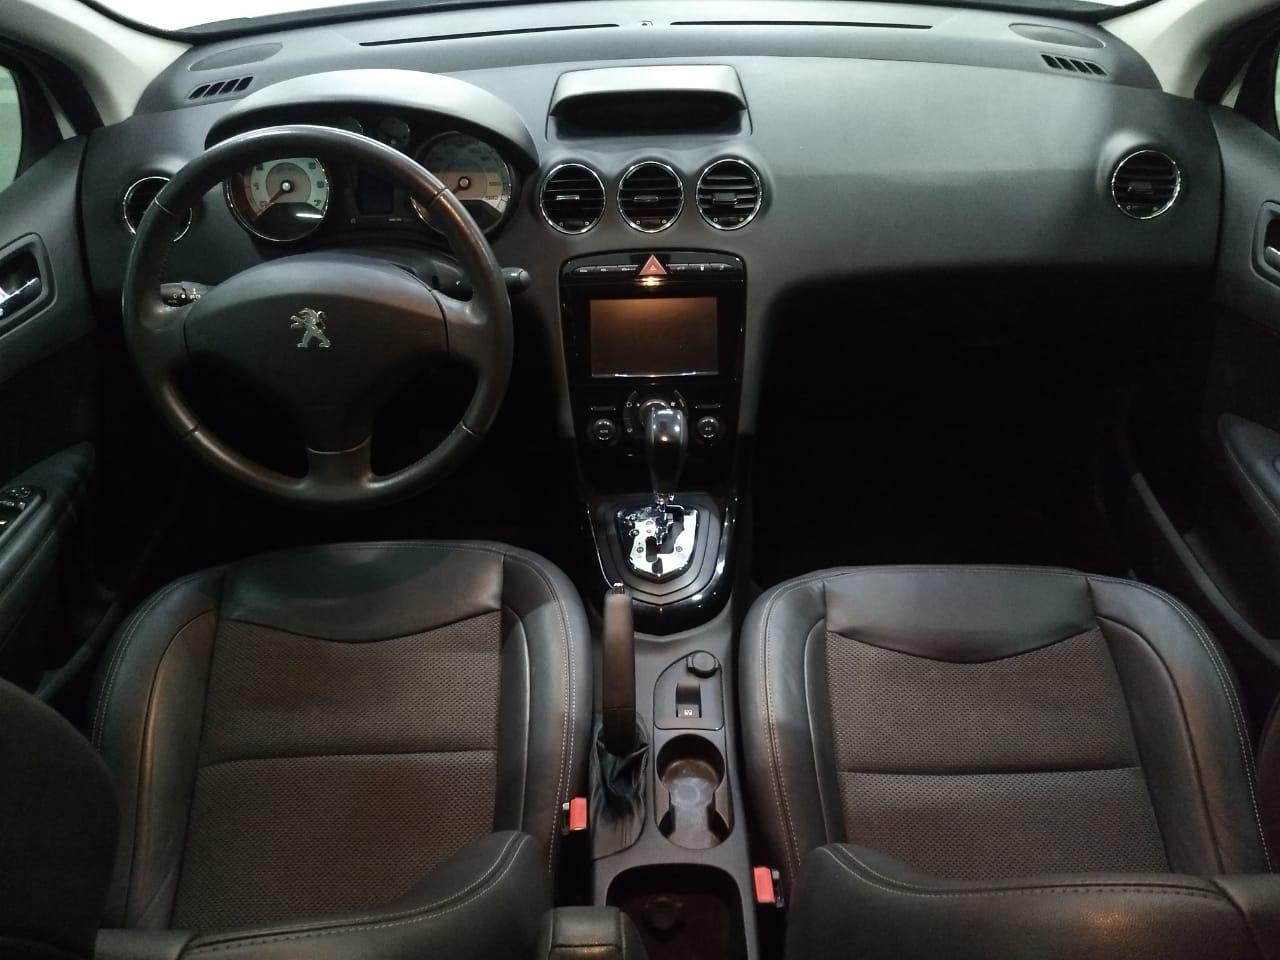 Peugeot 308 ALLURE 1.6L 2016